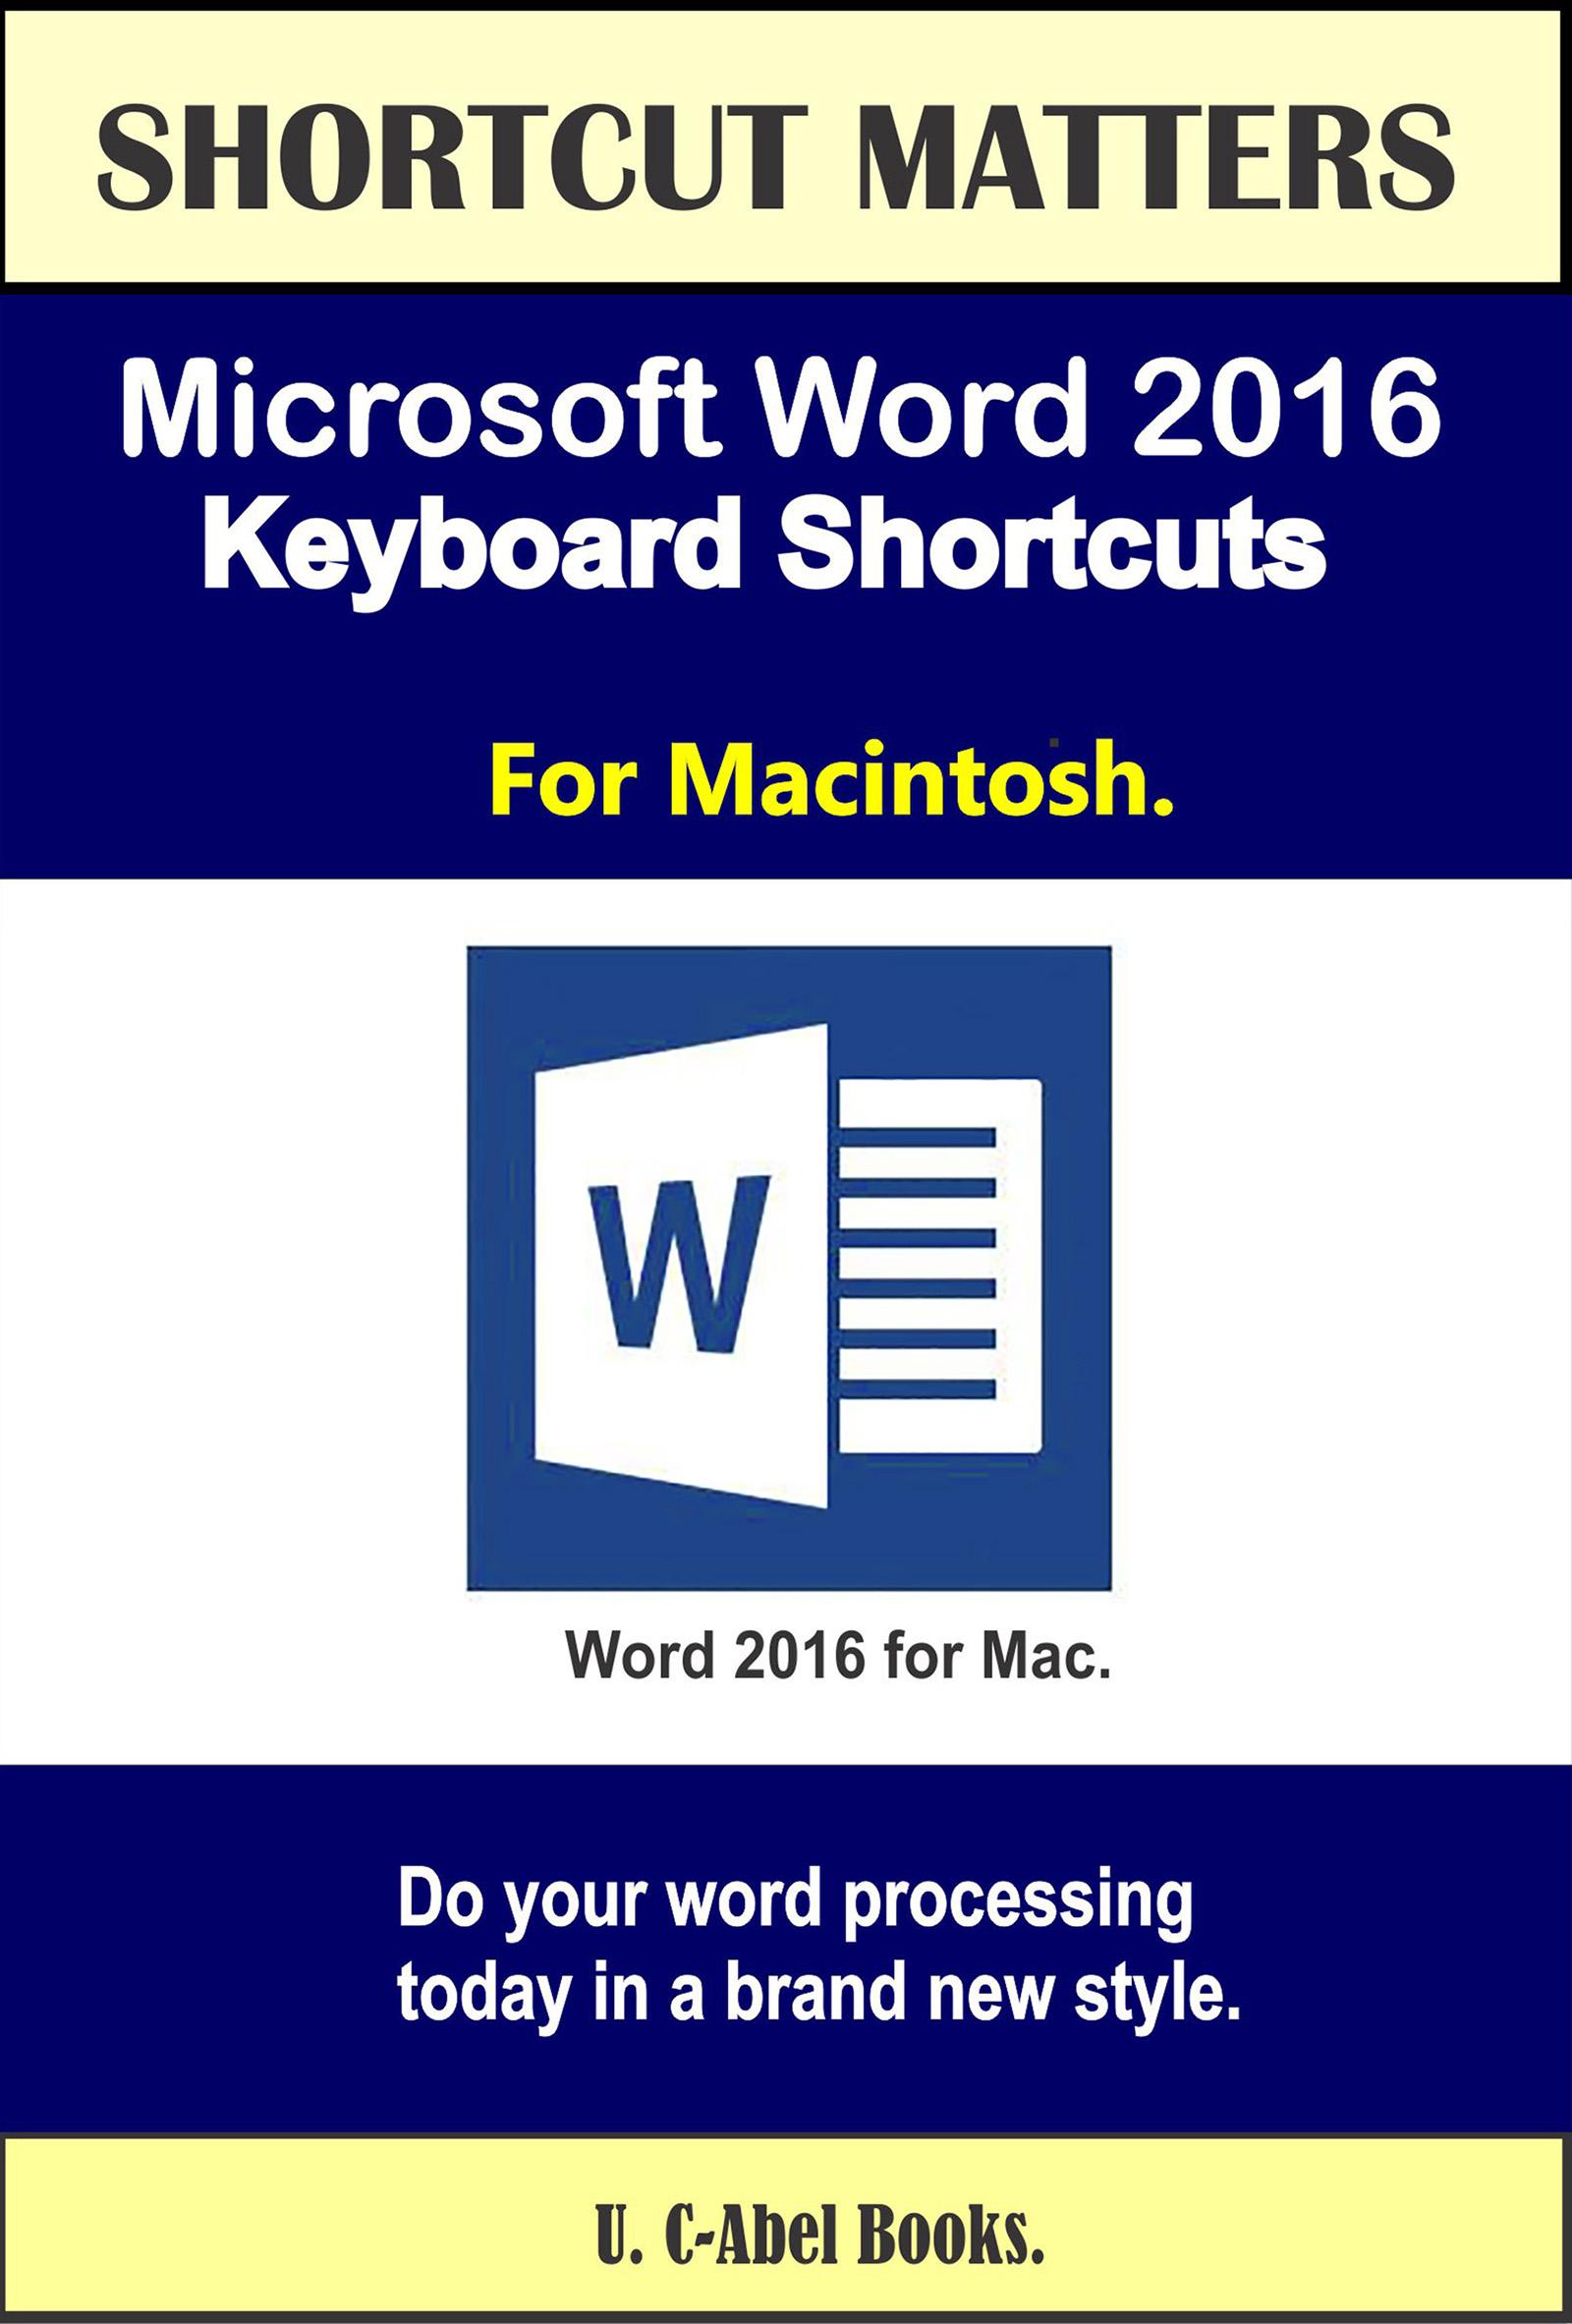 ms keyboard shortcuts